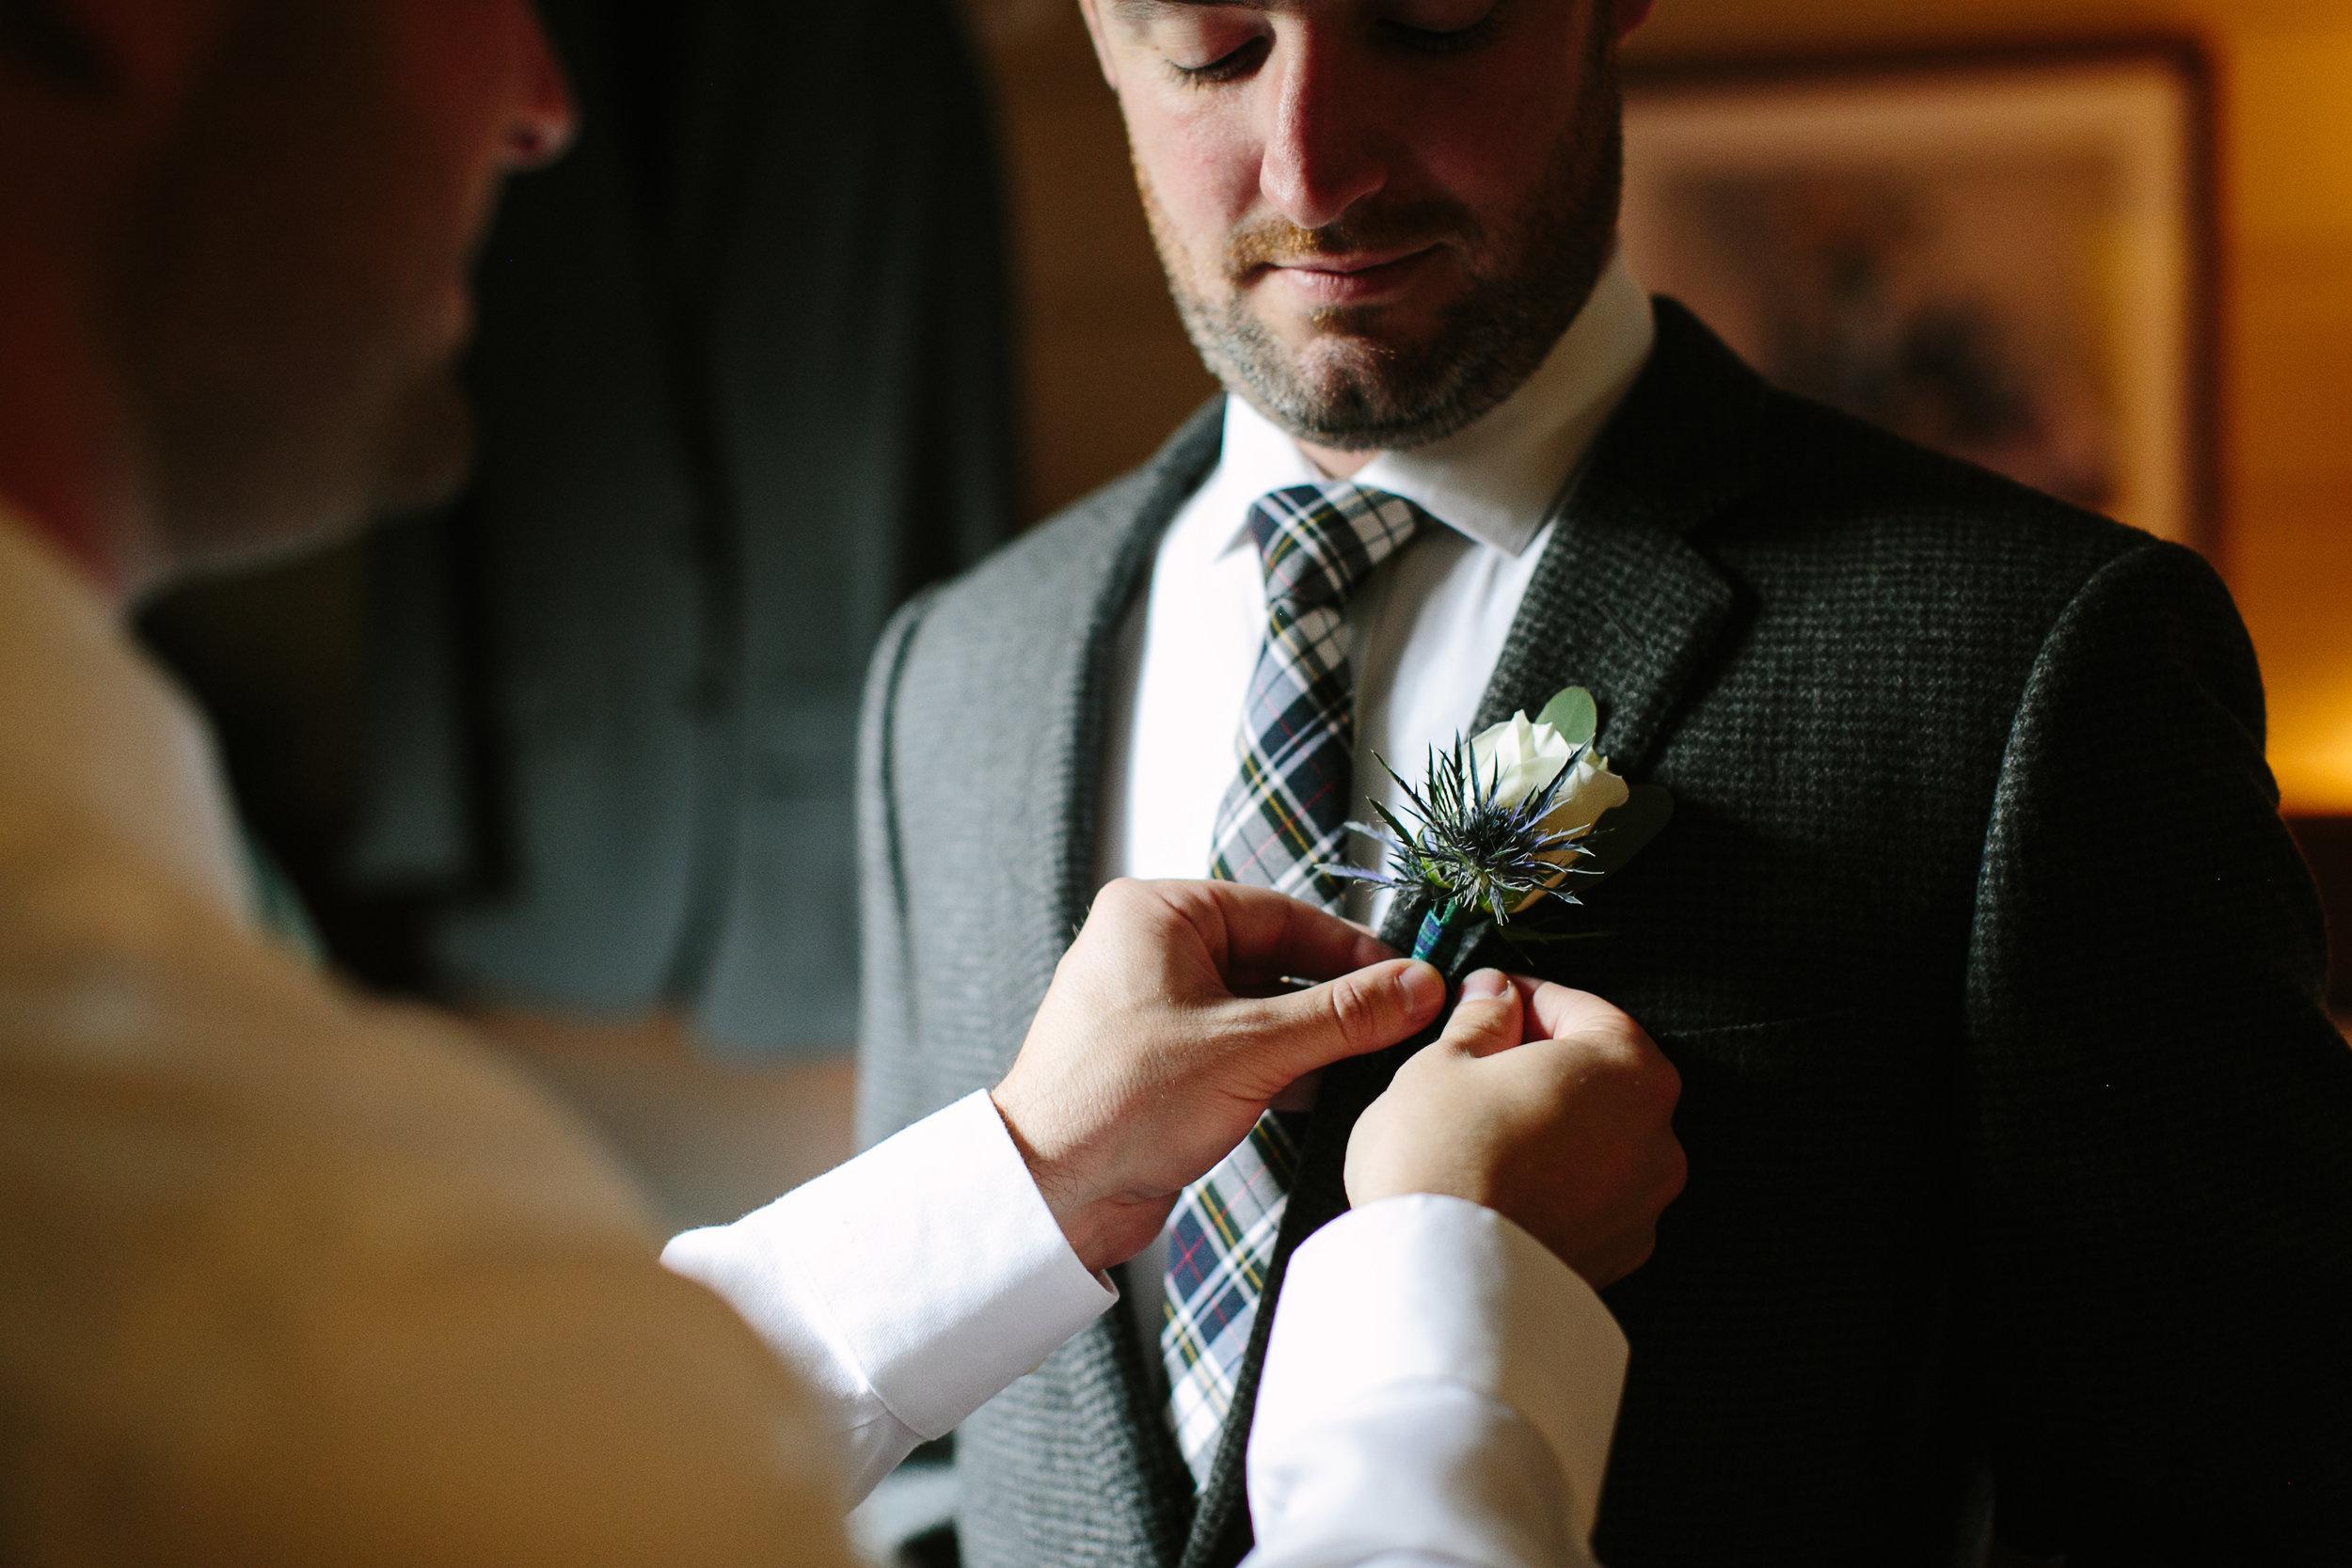 The Brae Loch Inn is a Wedding venue in Cazenovia, NY